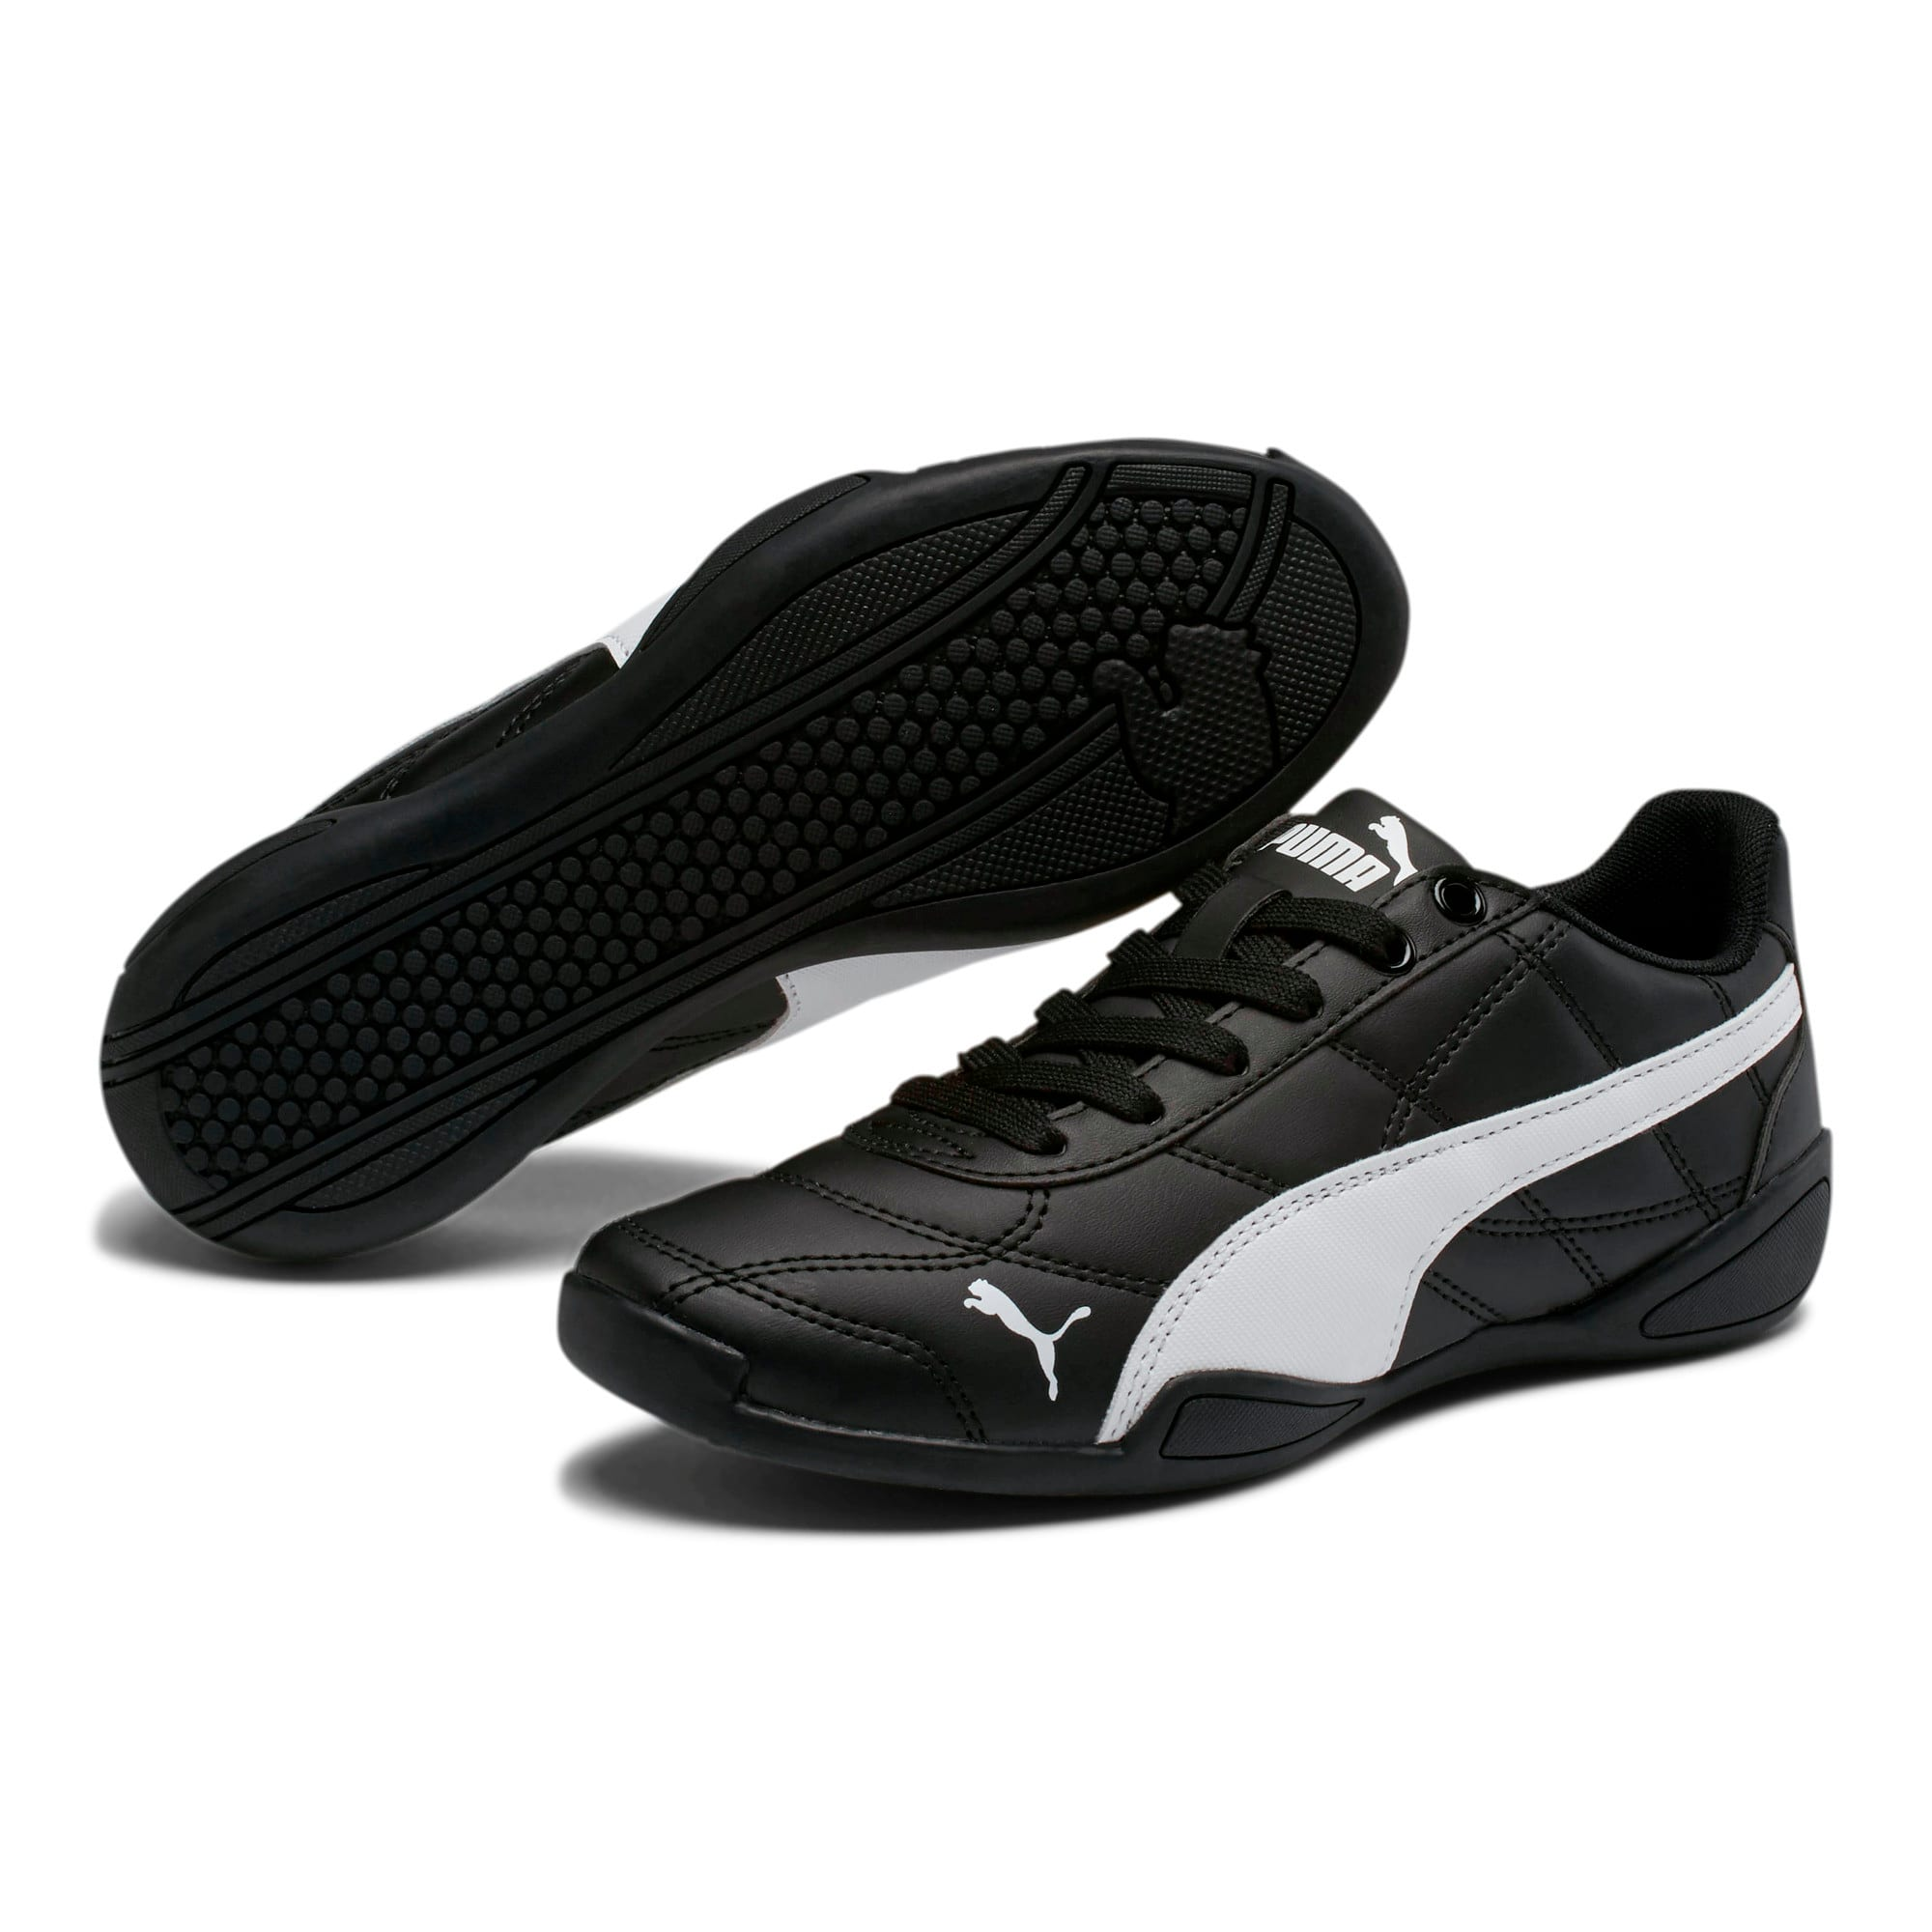 Miniatura 2 de ZapatosTune Cat 3para junior, Puma Black-Puma White, mediano